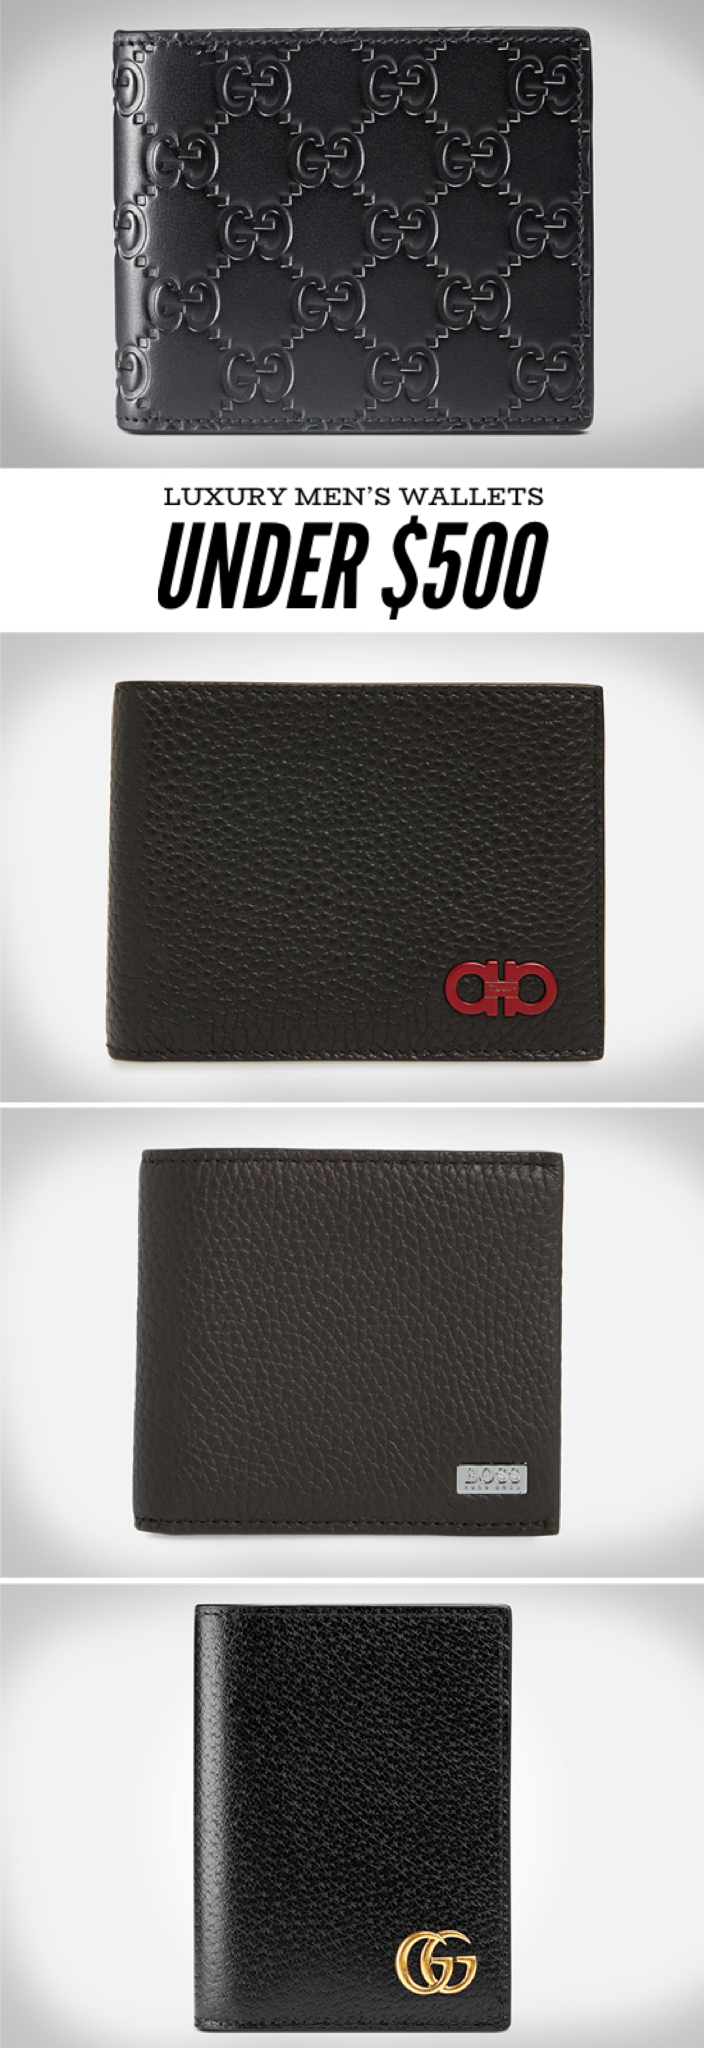 Luxury wallets for men under $500